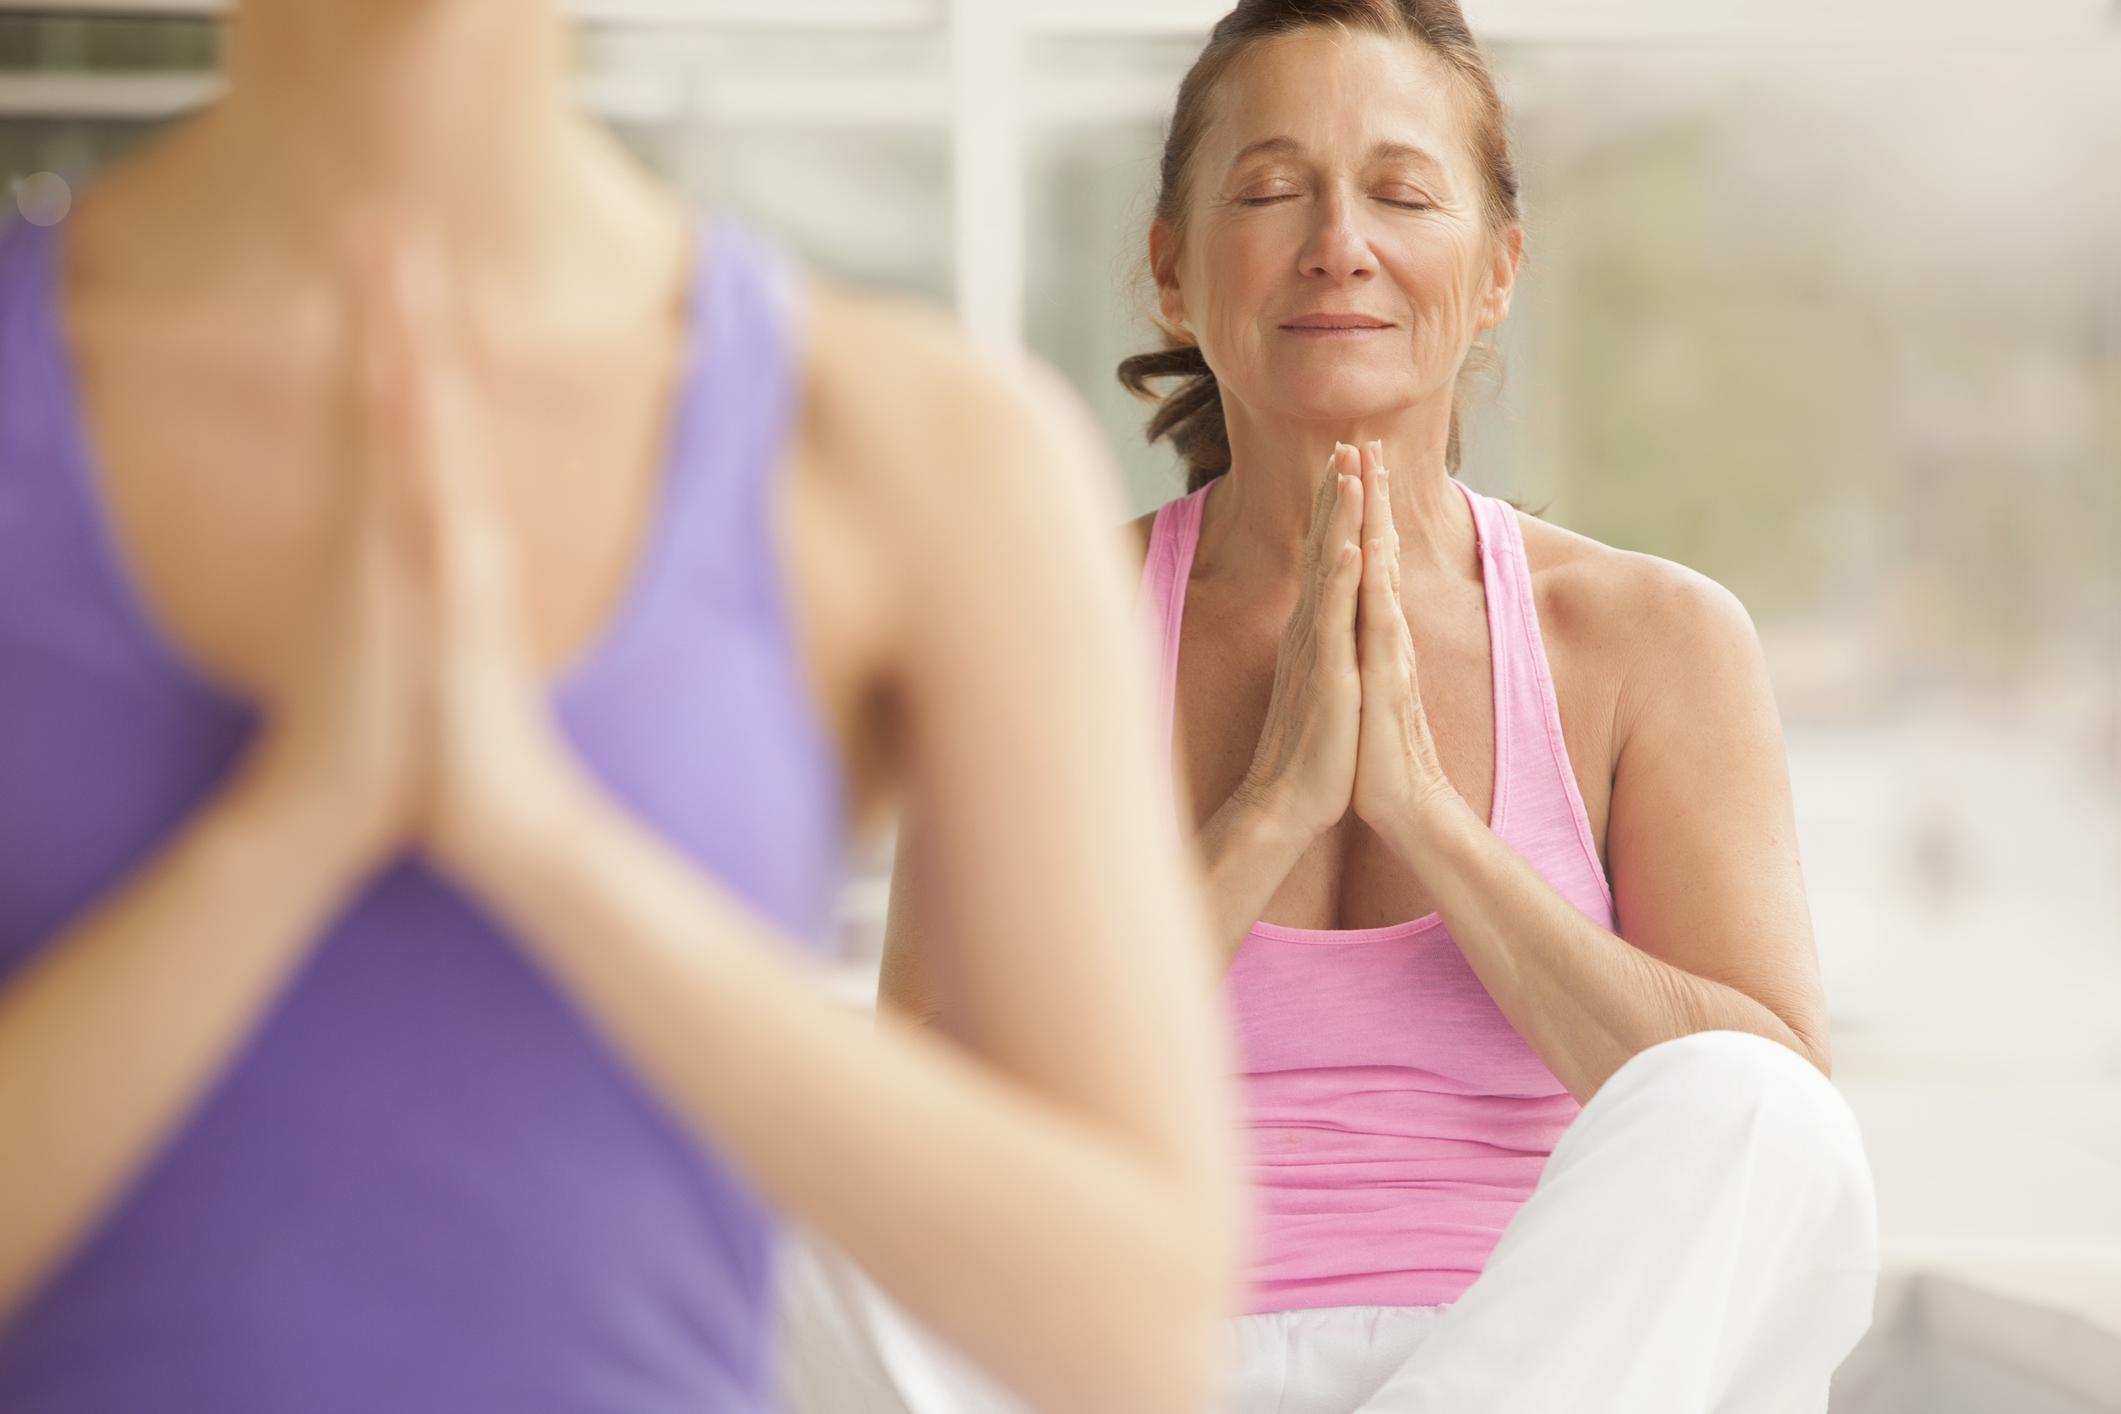 A Home Yoga Practice for Respiratory Wellness